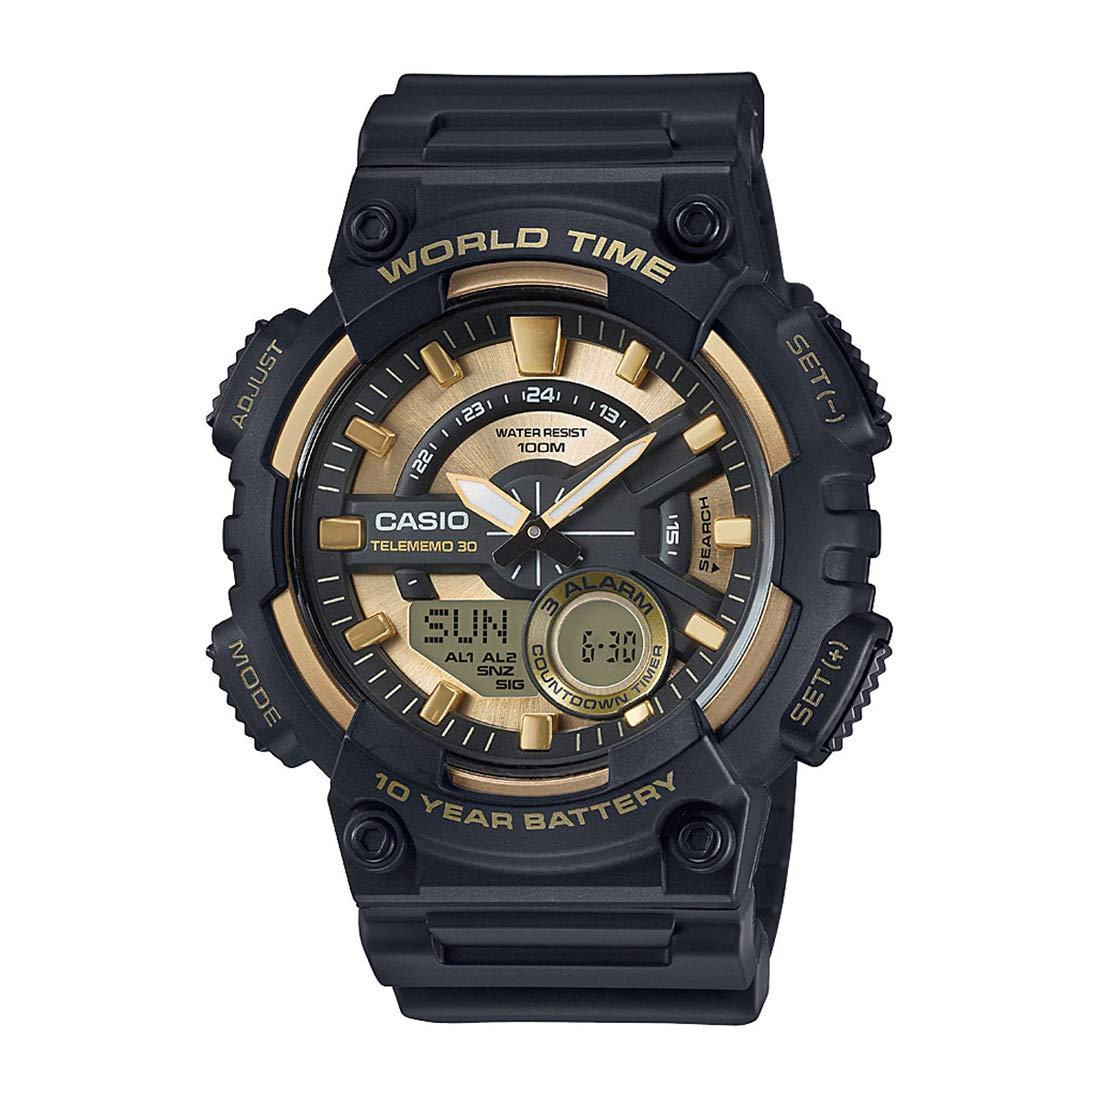 Casio Best Watches Brands For Men in India